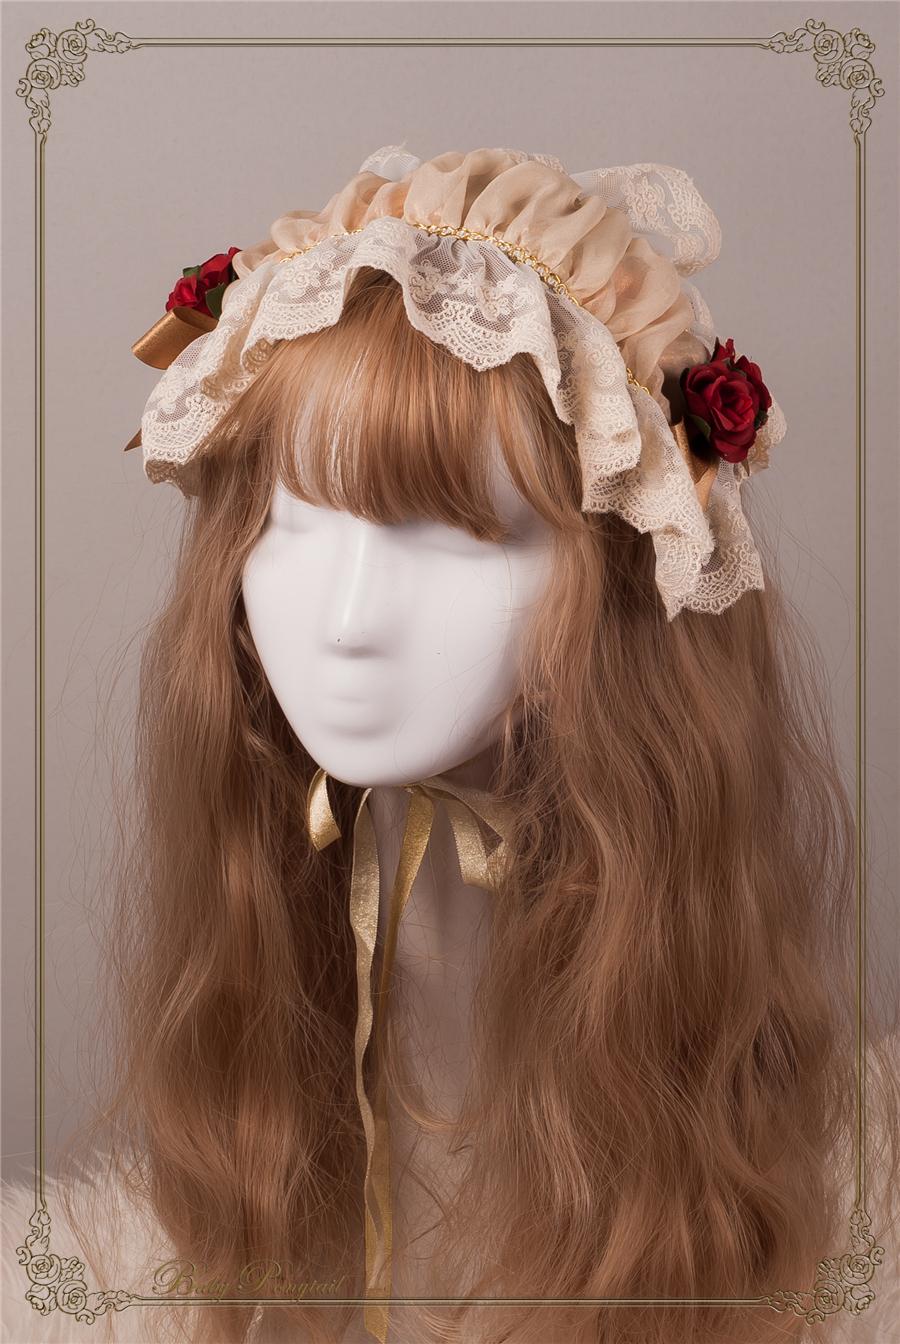 BabyPonytail_Rose Battle_Stock Photo_Petite Rose Head Dress Amber_3.jpg